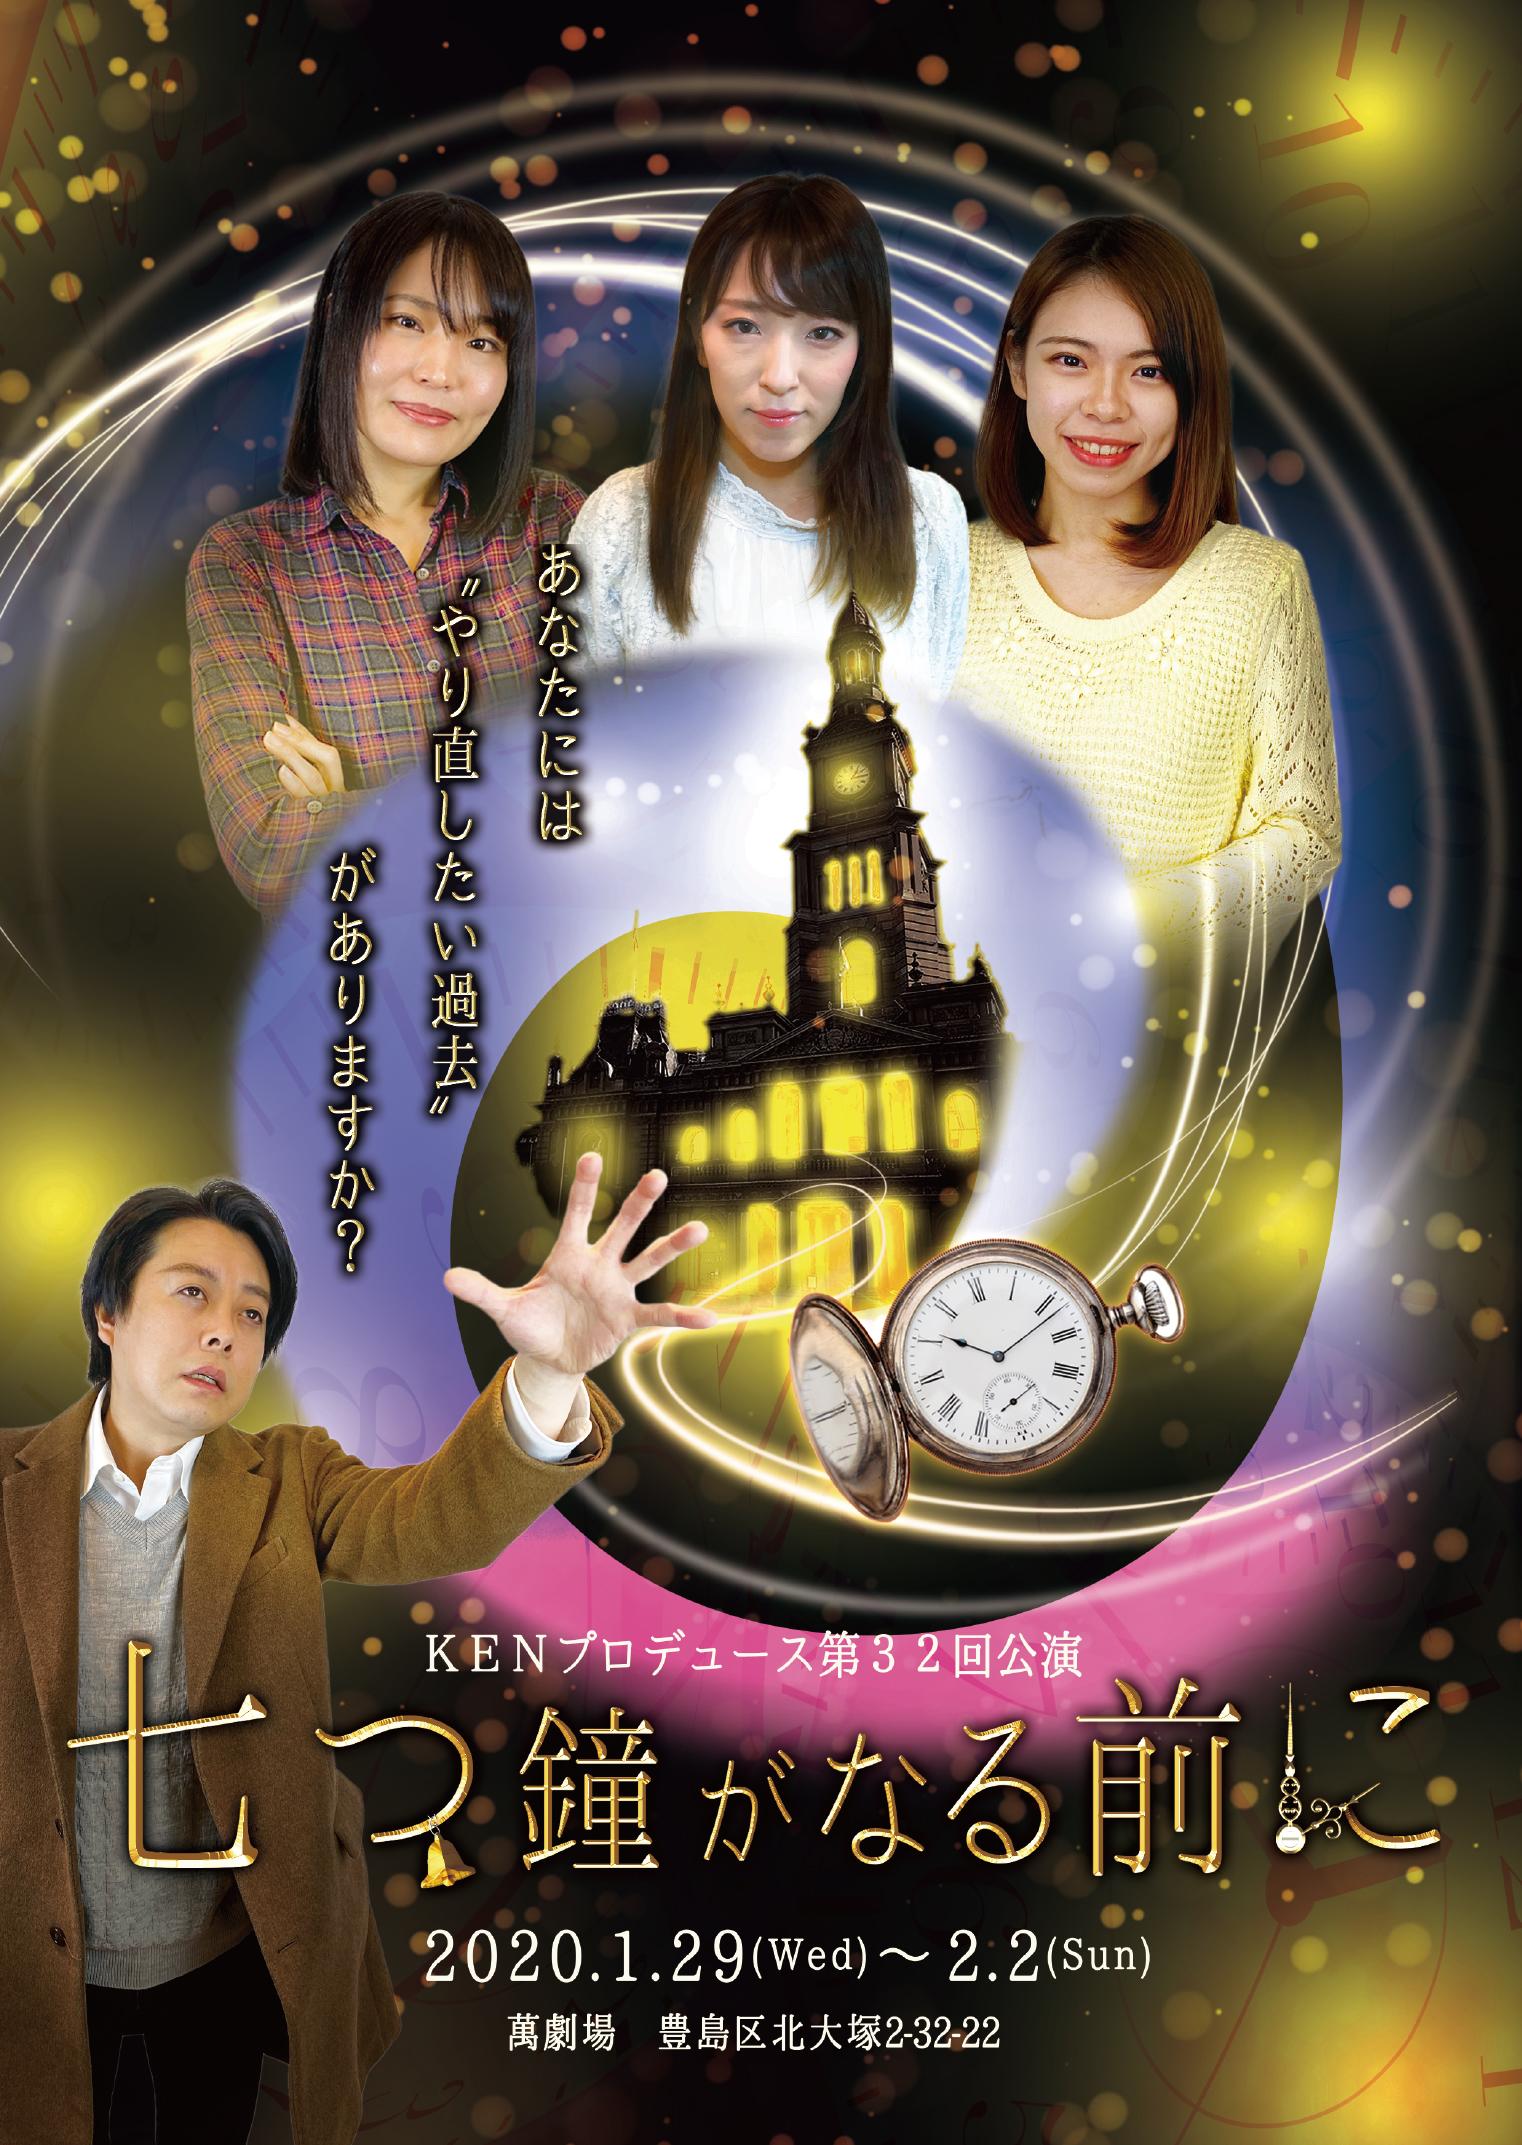 KENプロデュース第32回公演『七つ鐘が鳴る前に』 チームS DVD